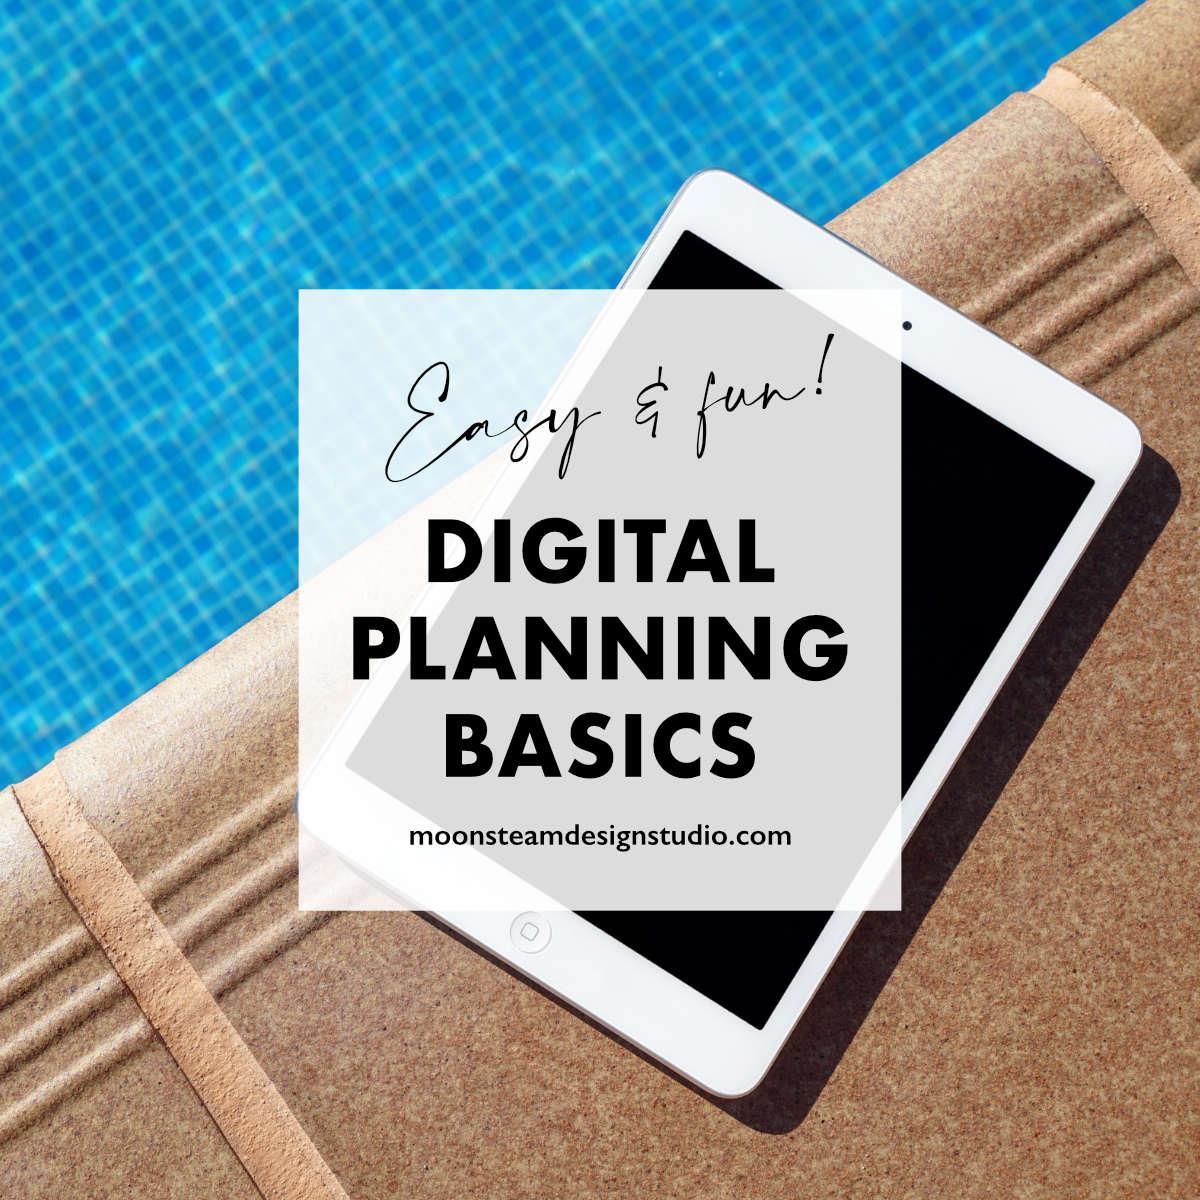 Digital Planning Basics by Moonsteam Design Studio